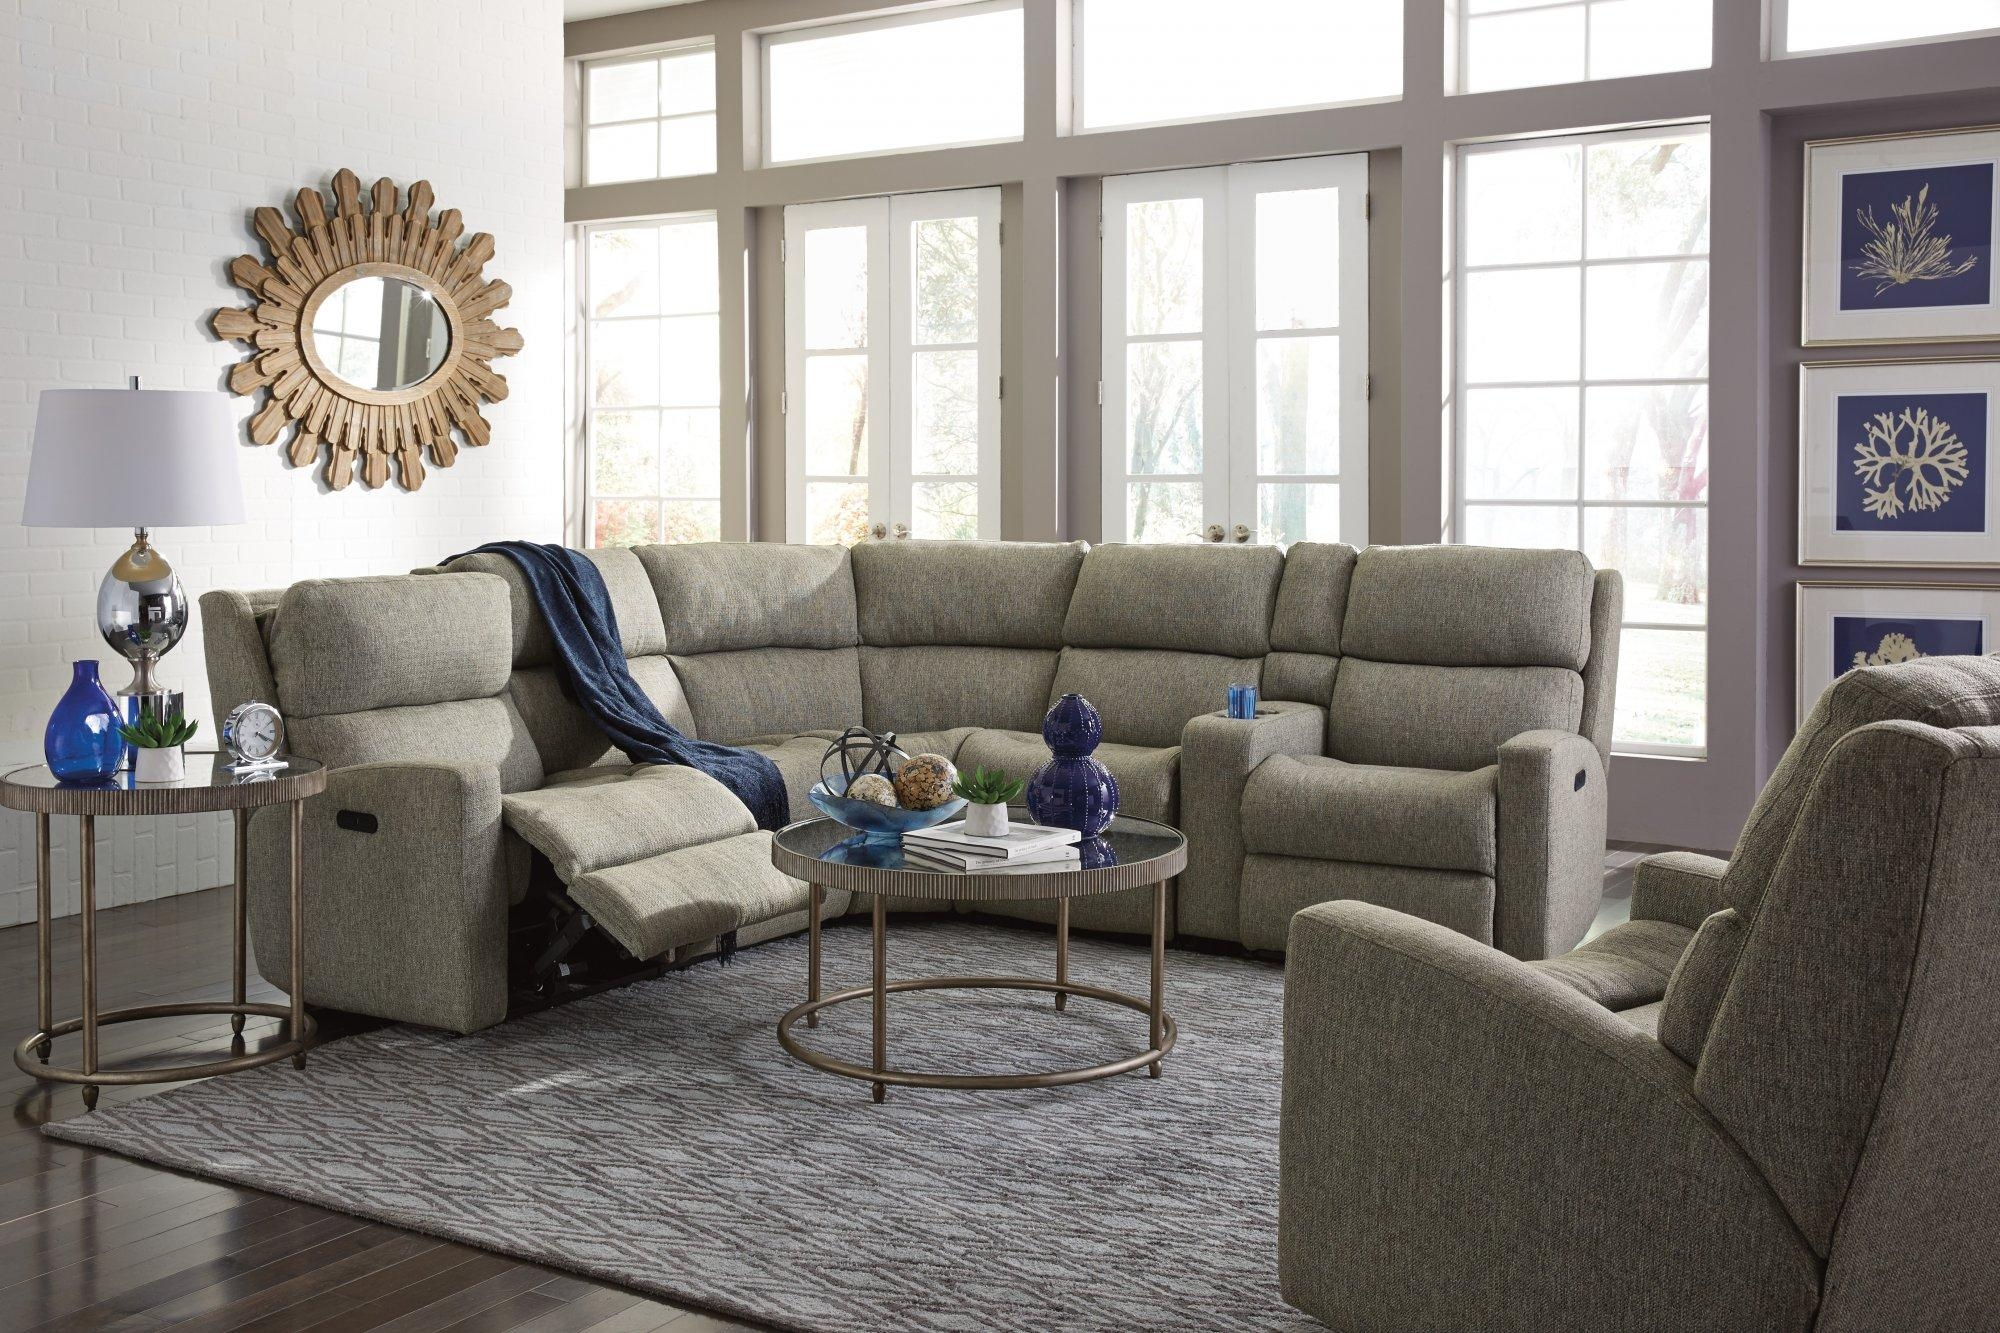 Furniture: Jedd Fabric Reclining Sectional Sofa | Sectional Within Jedd Fabric Reclining Sectional Sofa (Image 13 of 20)